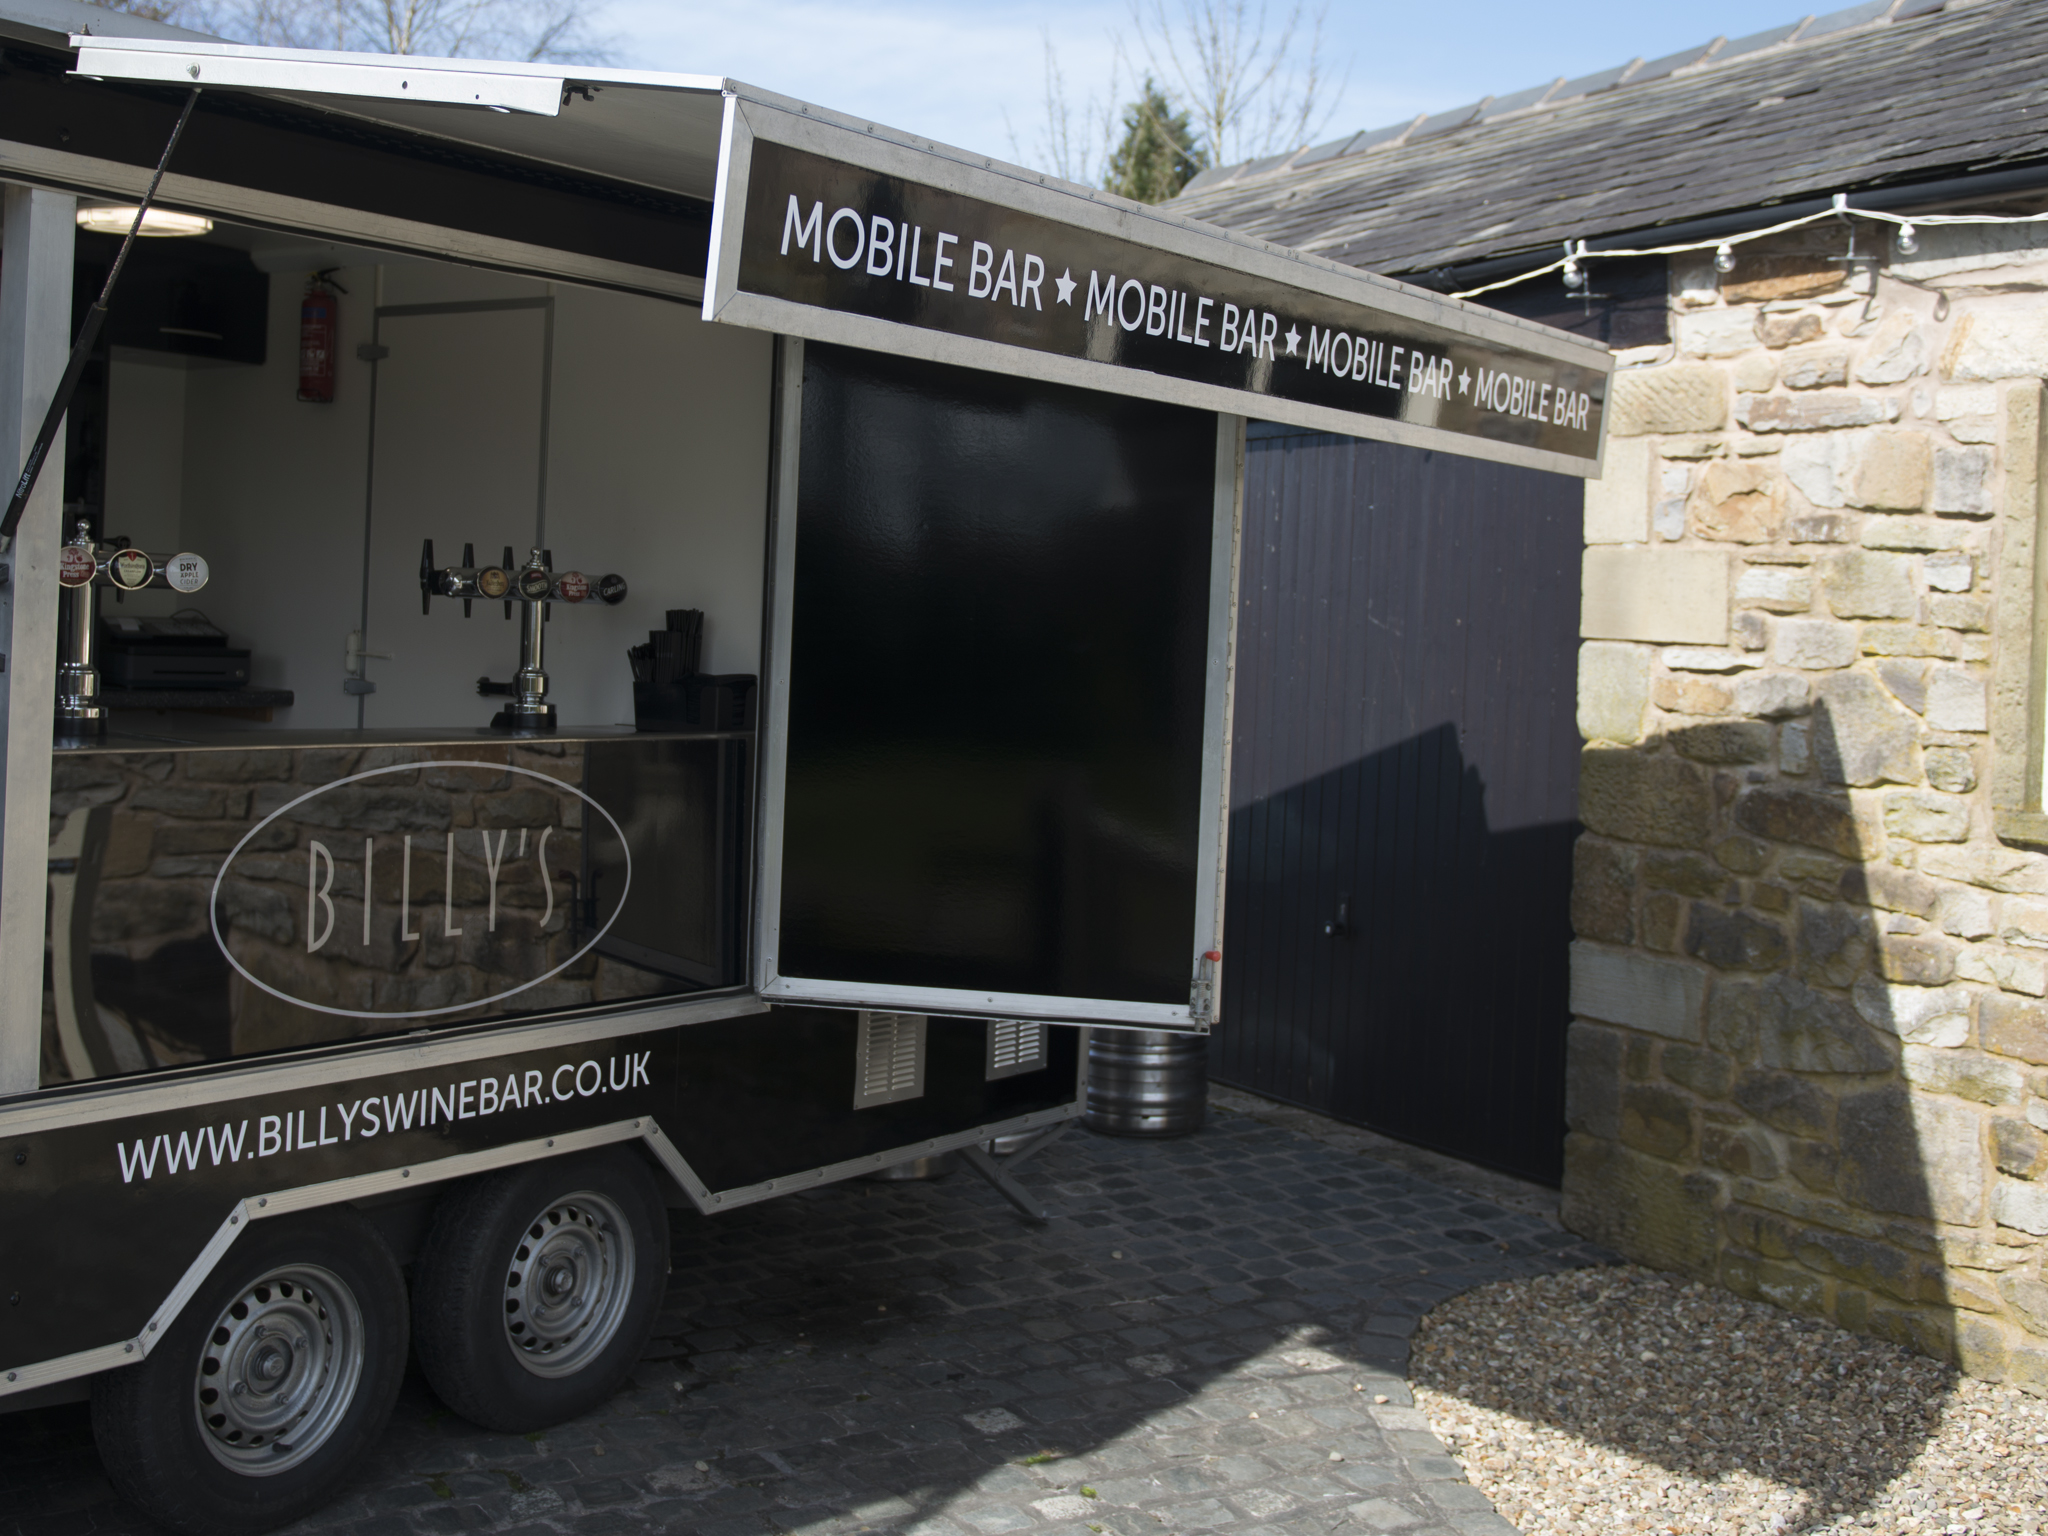 Billy's mobile bar.